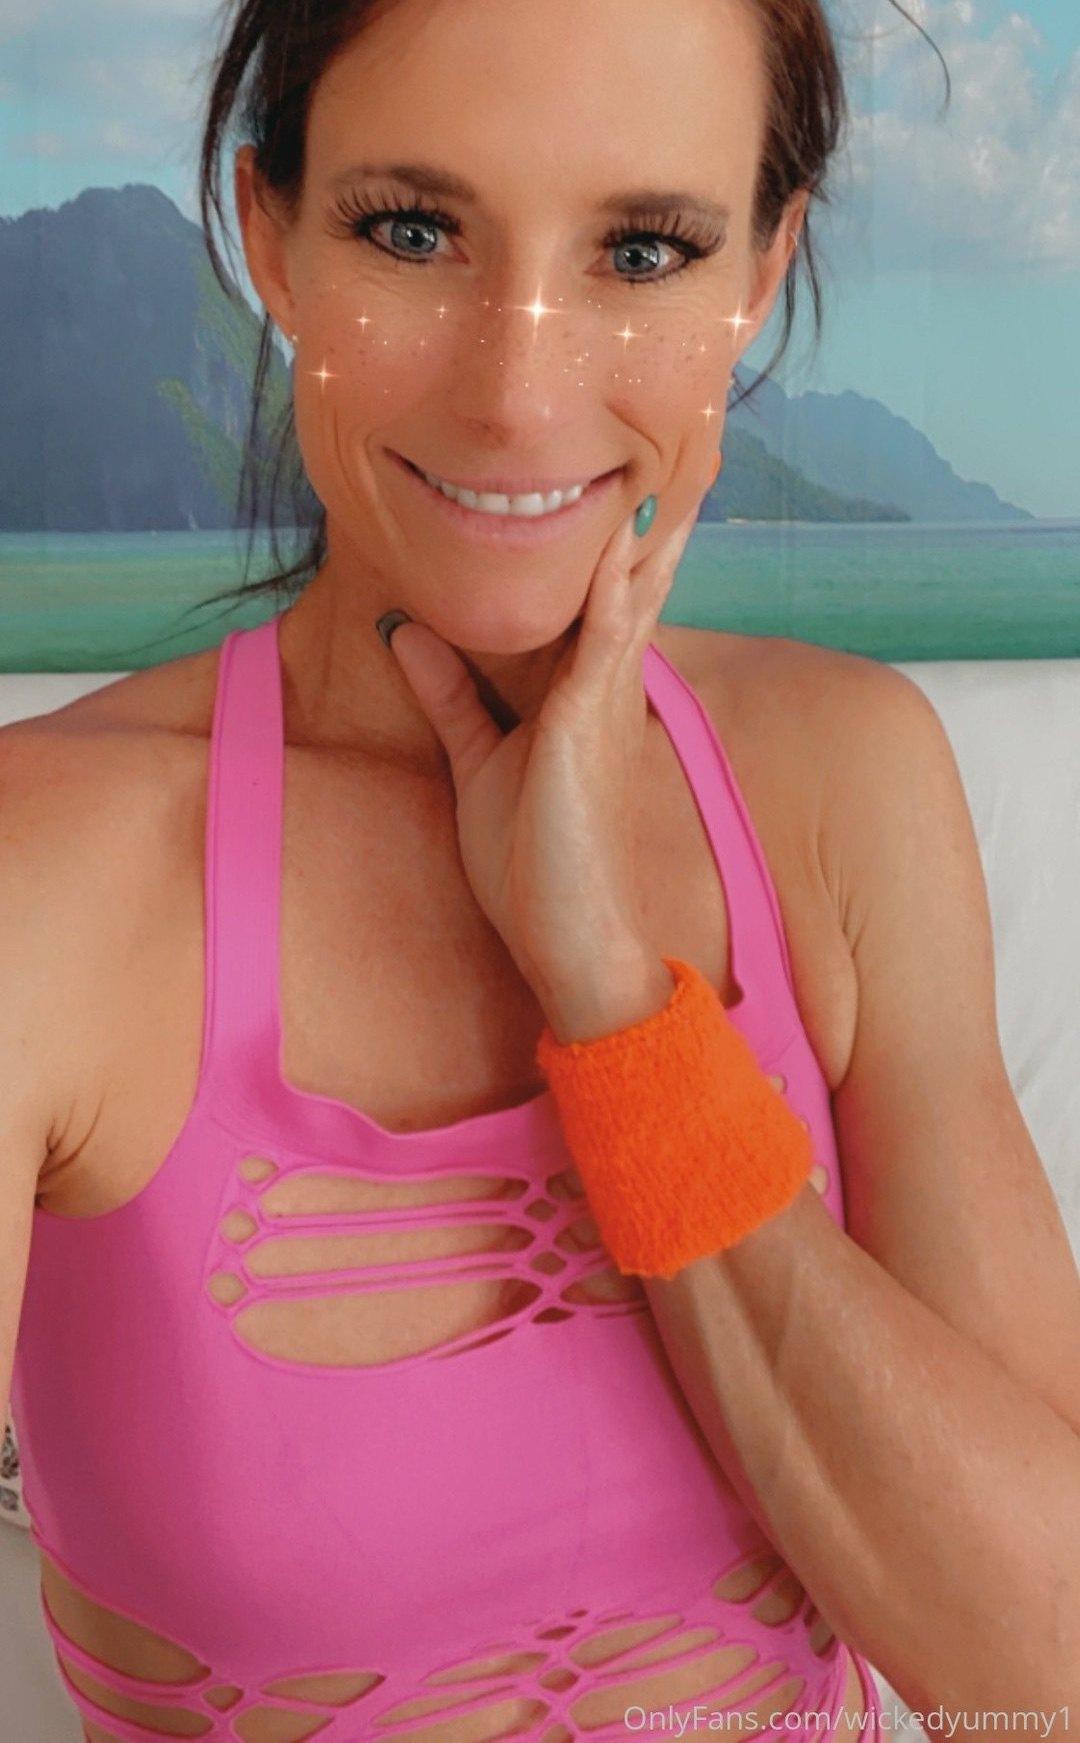 Sofie Marie Wickedyummy1 Onlyfans Nudes Leaks 0027